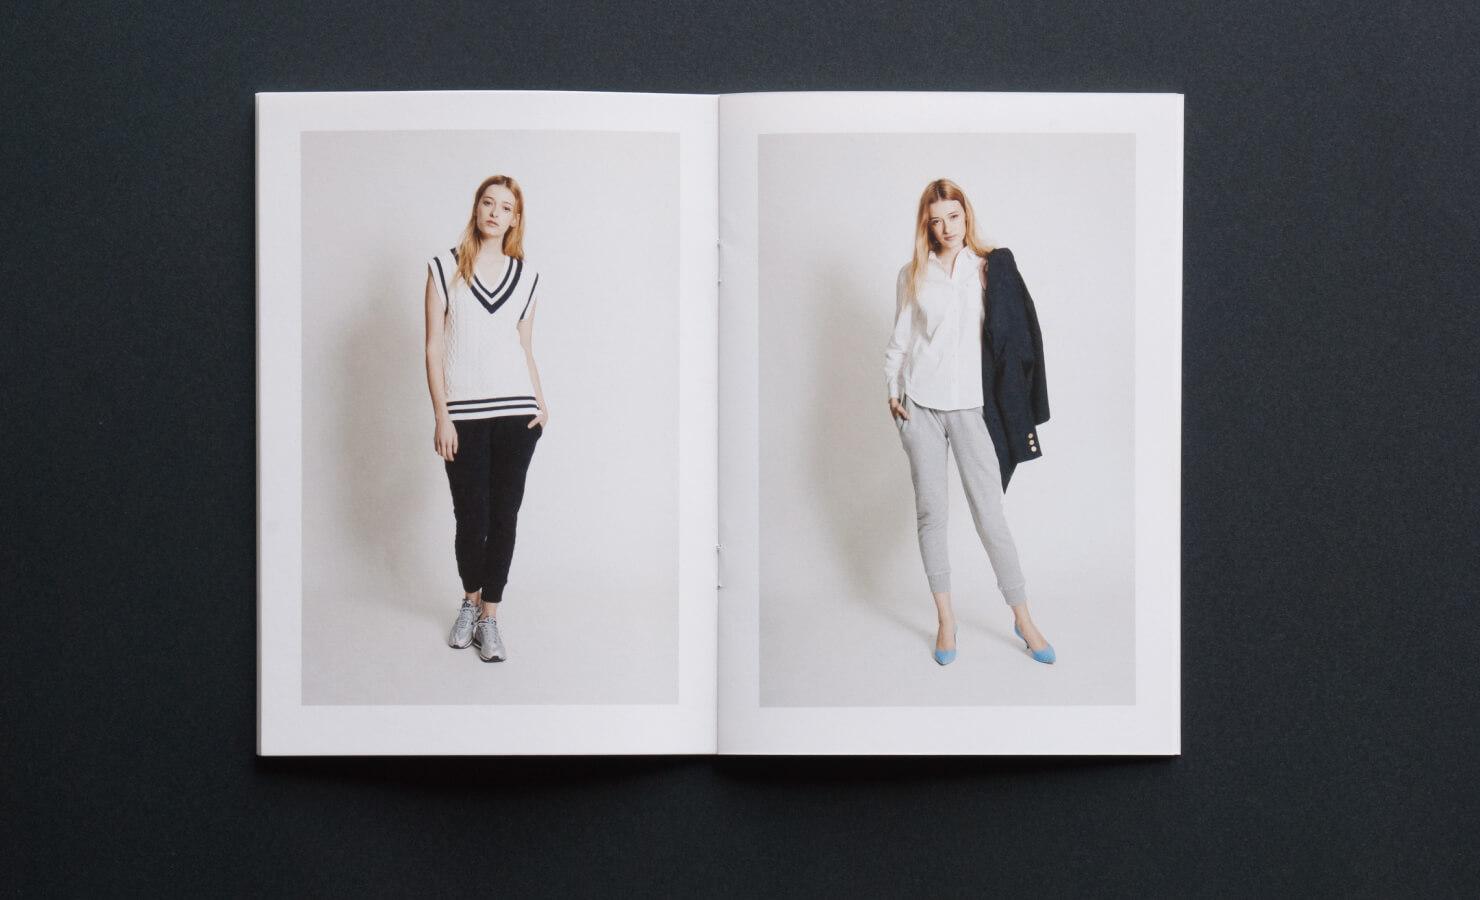 Rita Jeans Tokyo 15SS